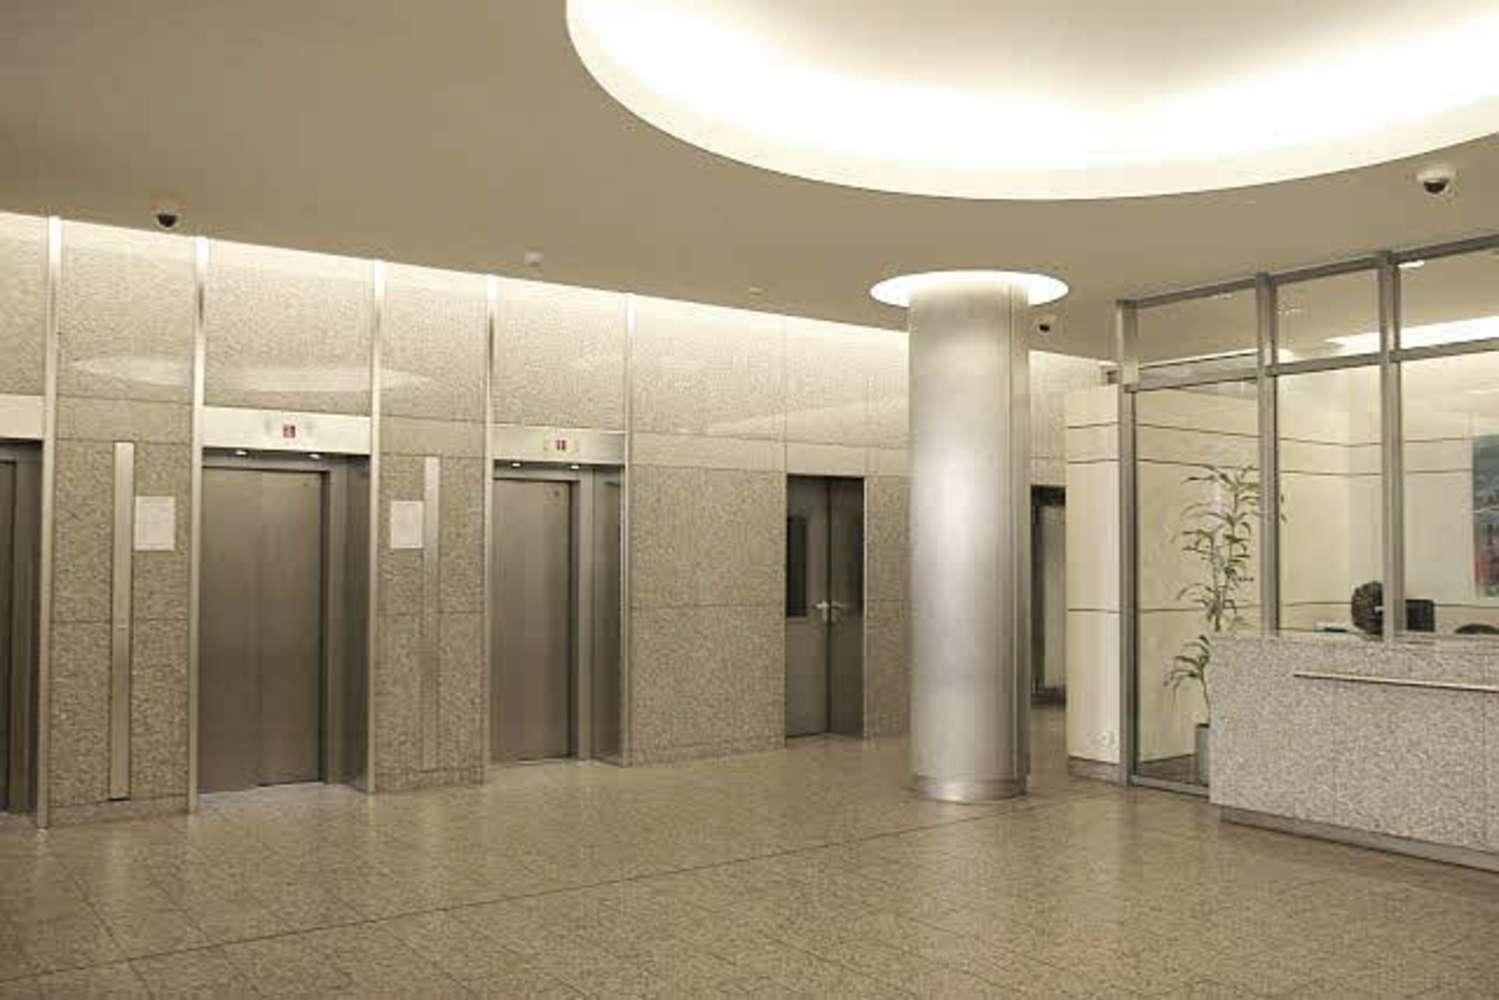 Büros Frankfurt am main, 60594 - Büro - Frankfurt am Main, Sachsenhausen - F0092 - 10443117